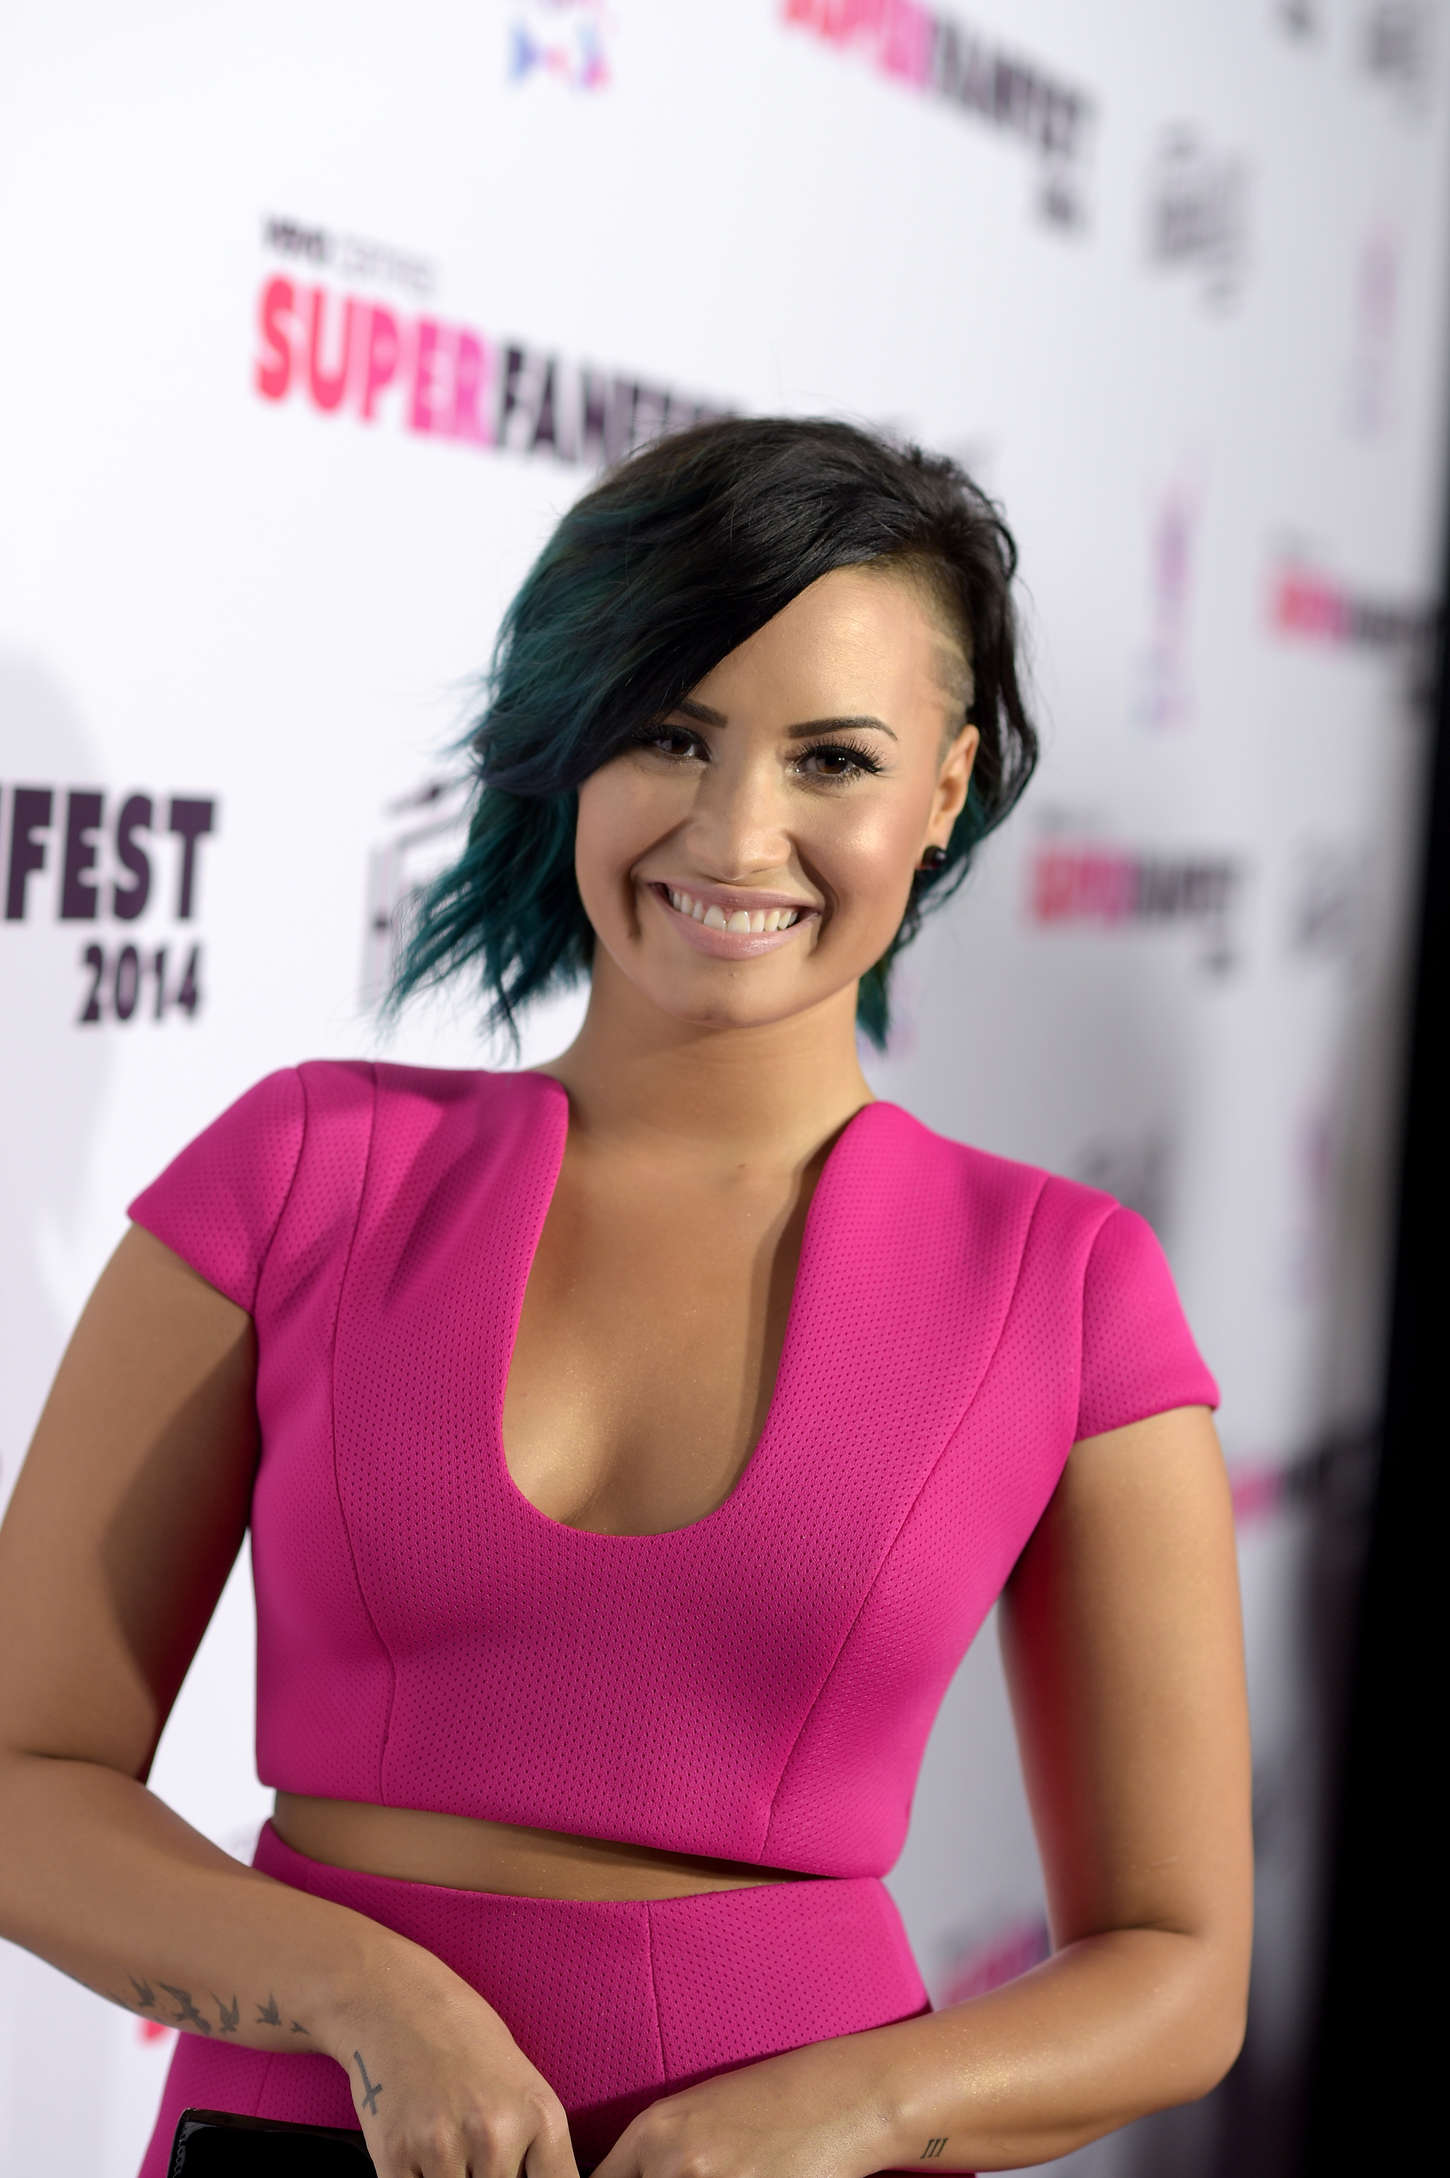 Demi Lovato Devonne >> Demi Lovato - 2014 Vevo CERTIFIED SuperFanFest -02 - GotCeleb